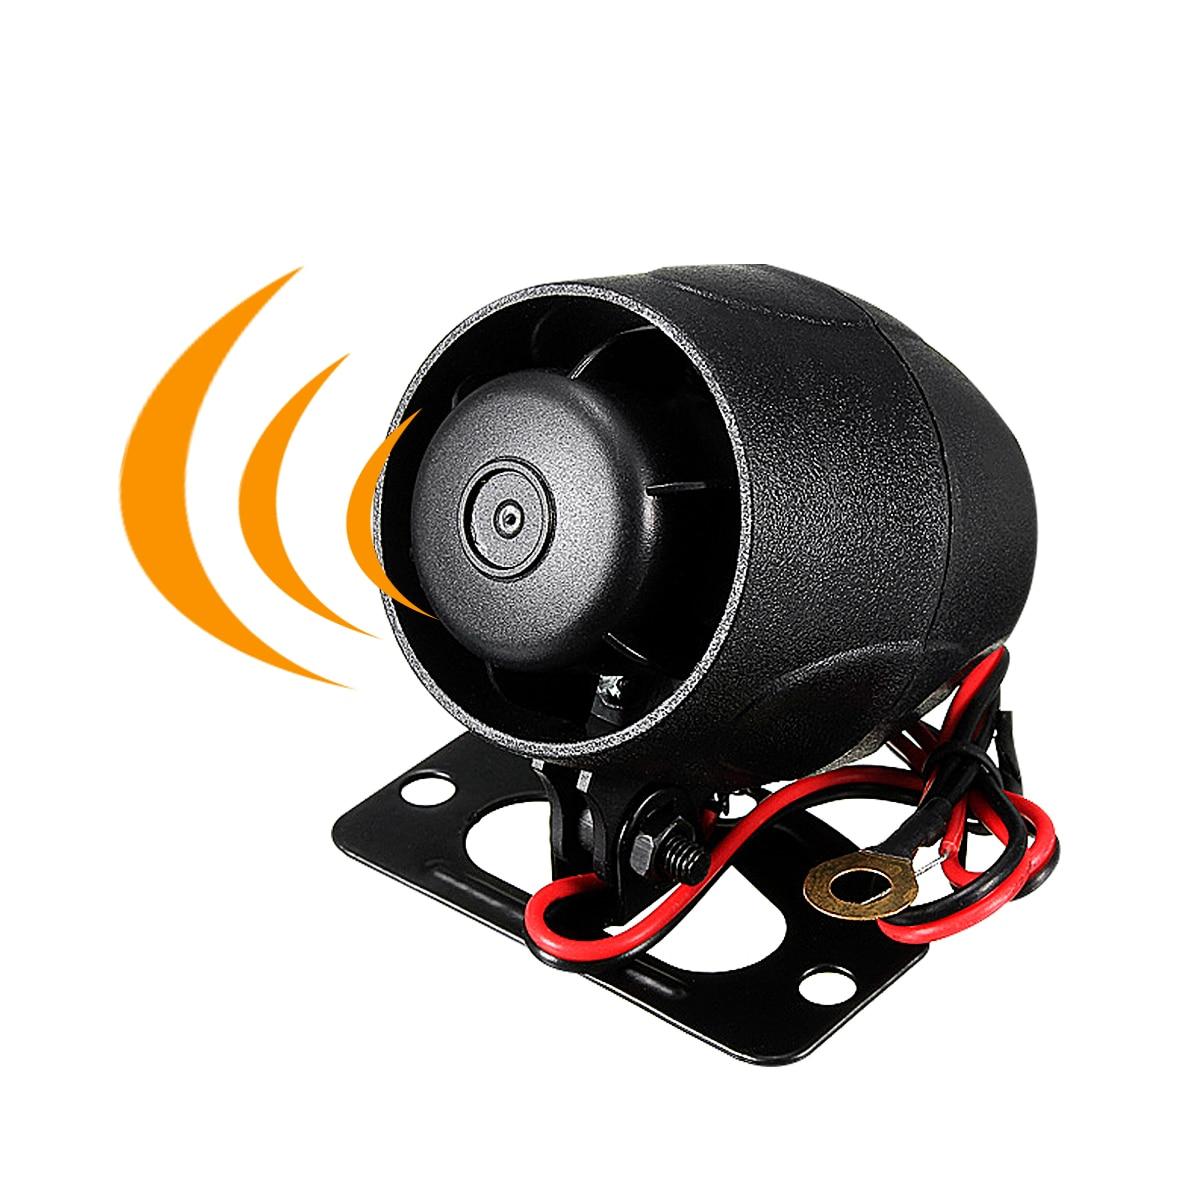 Safurance 12V DC Car Van Truck Auto Bike Vehicle Alarm Warning Siren Horn Security Black Home Safety